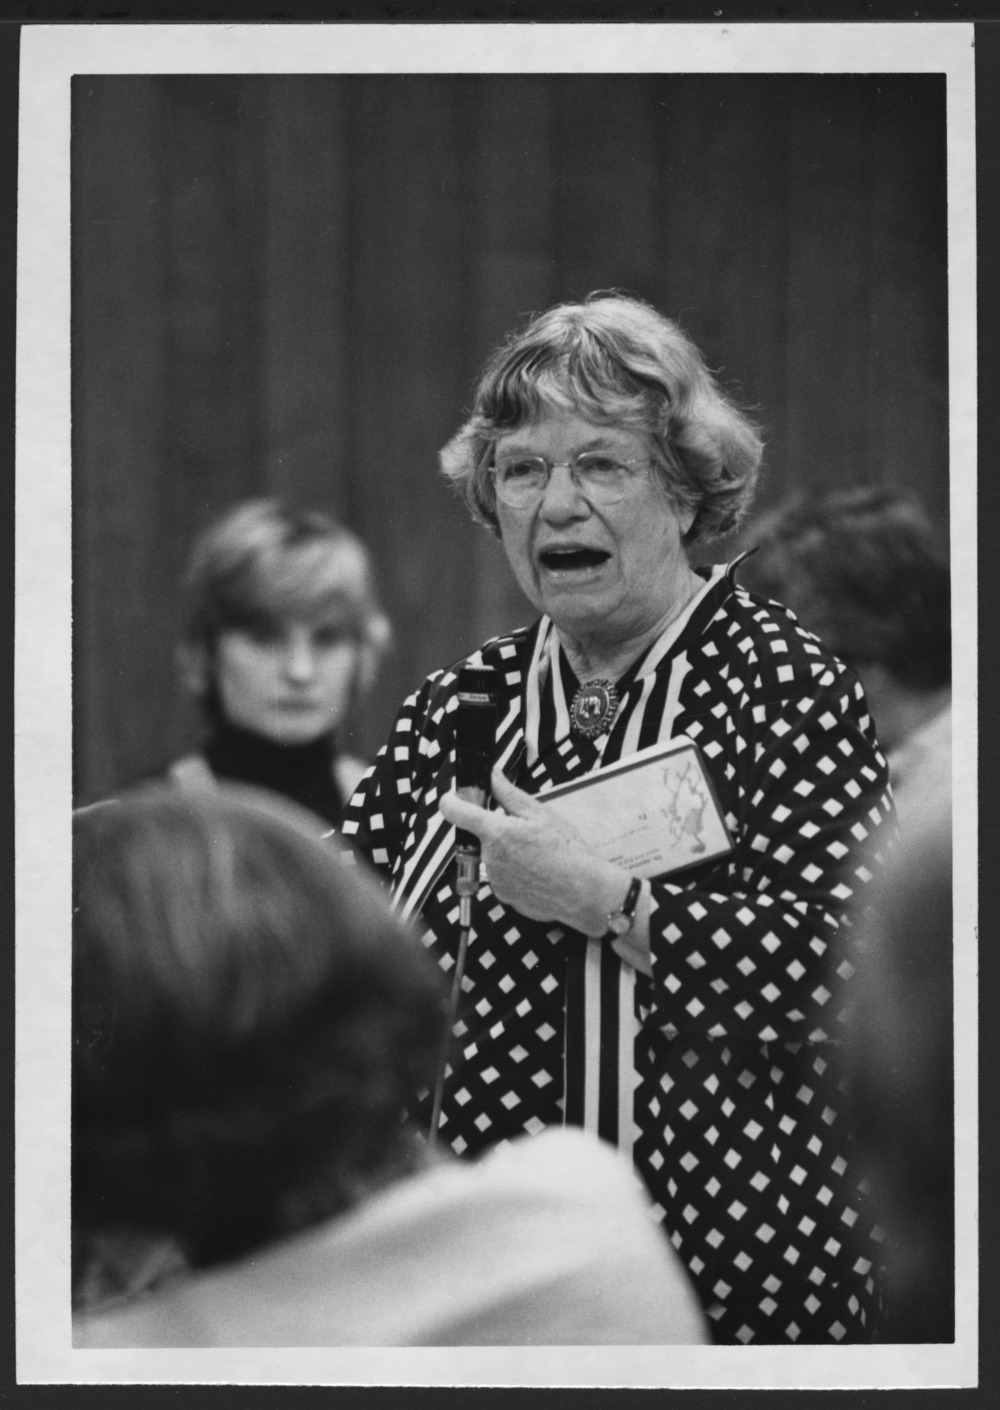 Margaret  Mead visiting at the Menninger Foundation, Topeka, Kansas